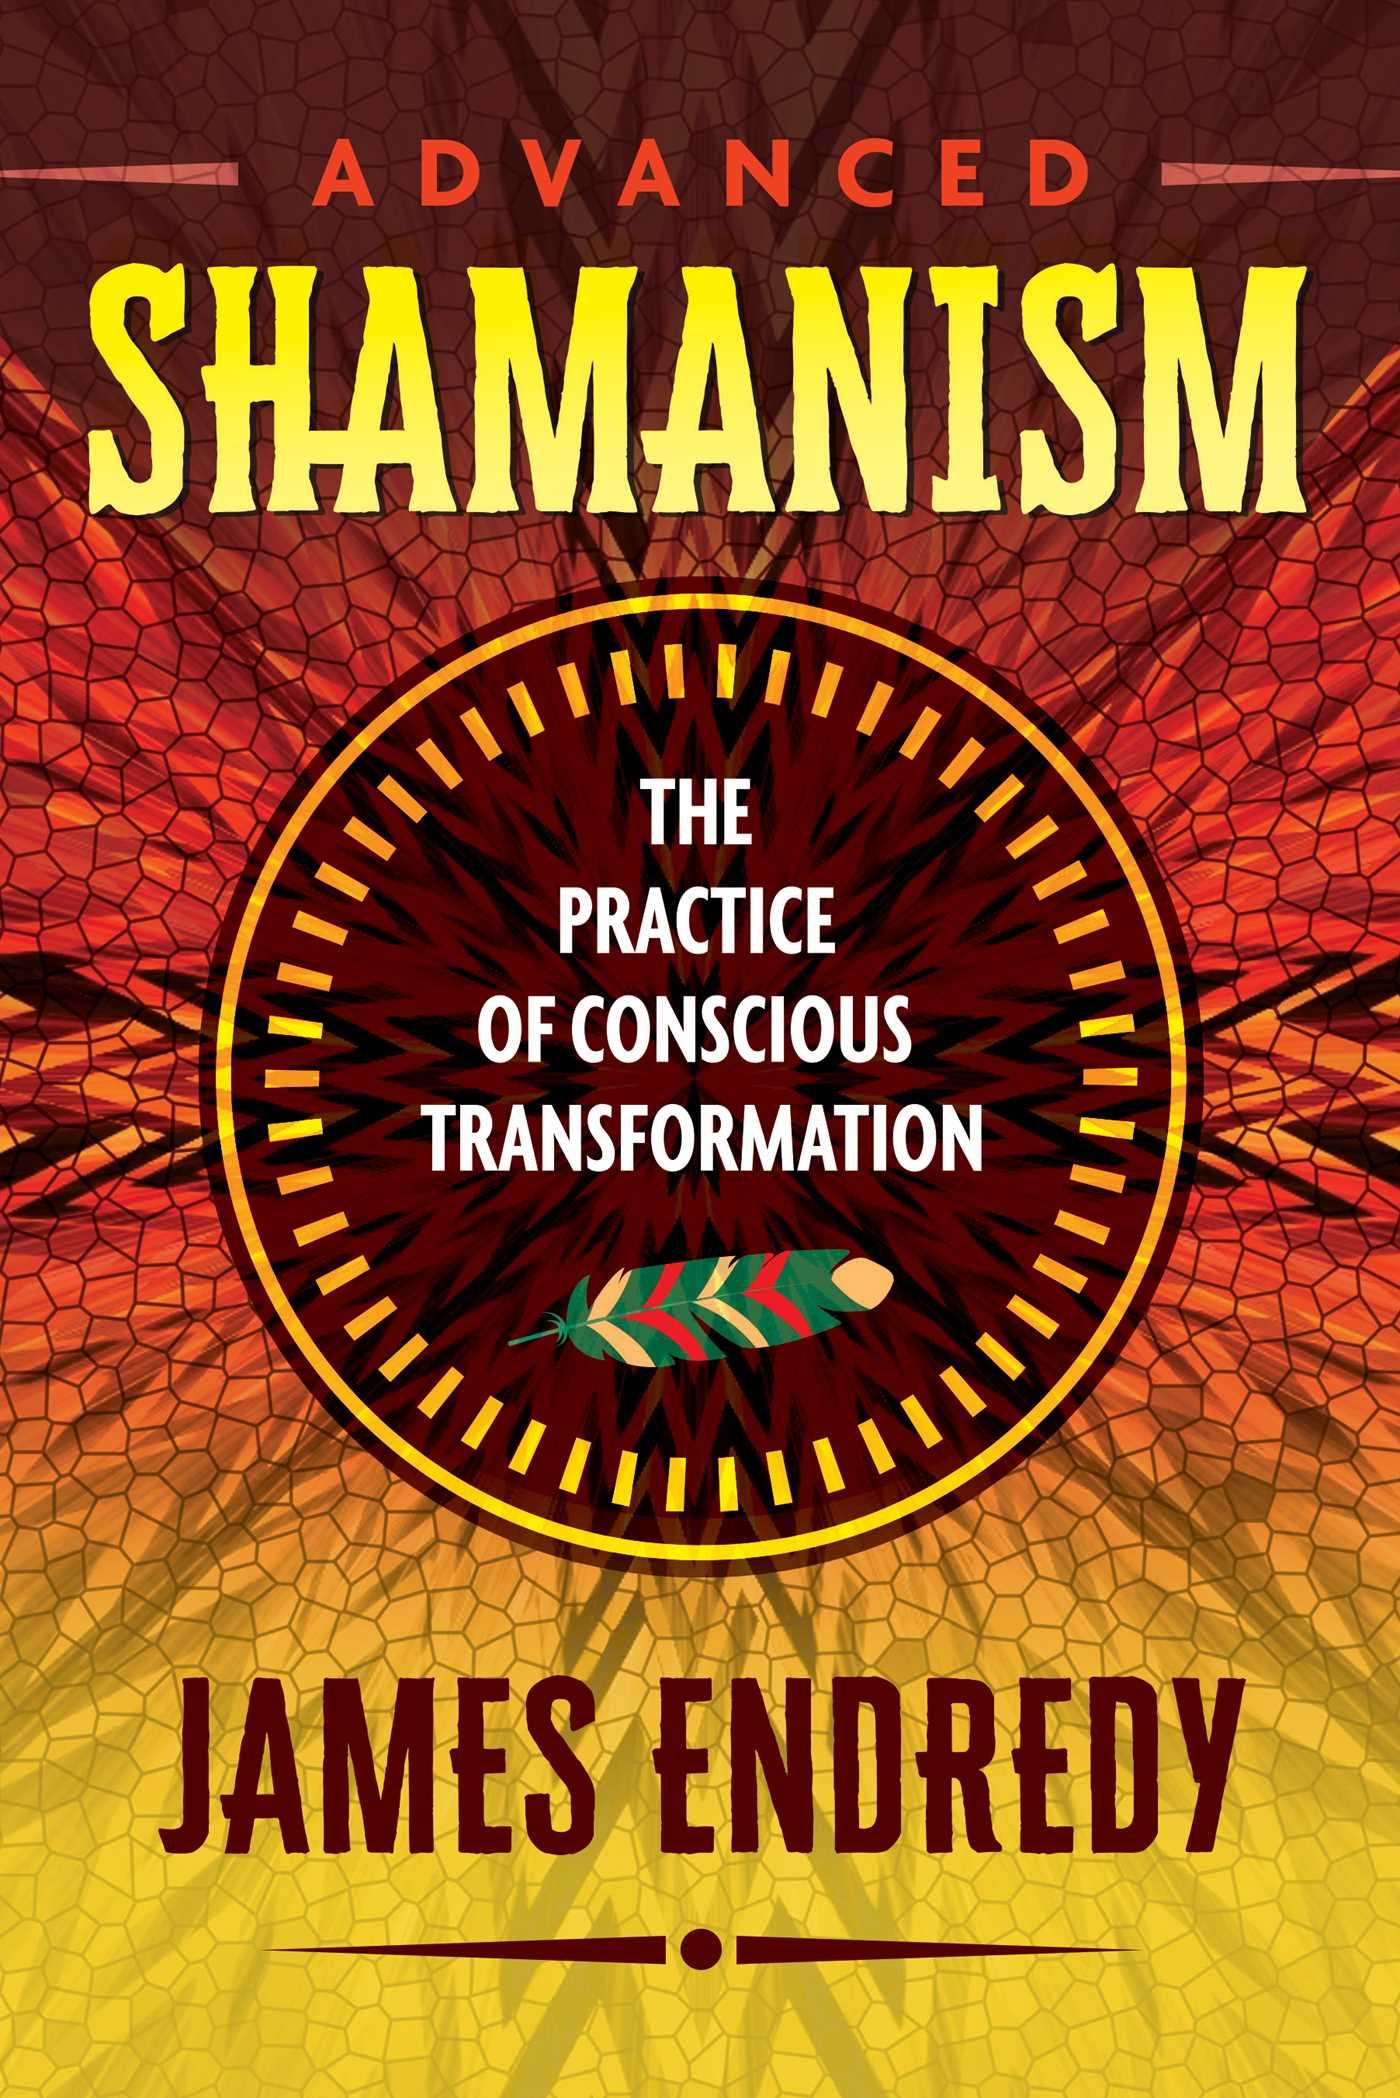 Advanced shamanism 9781591432838 hr